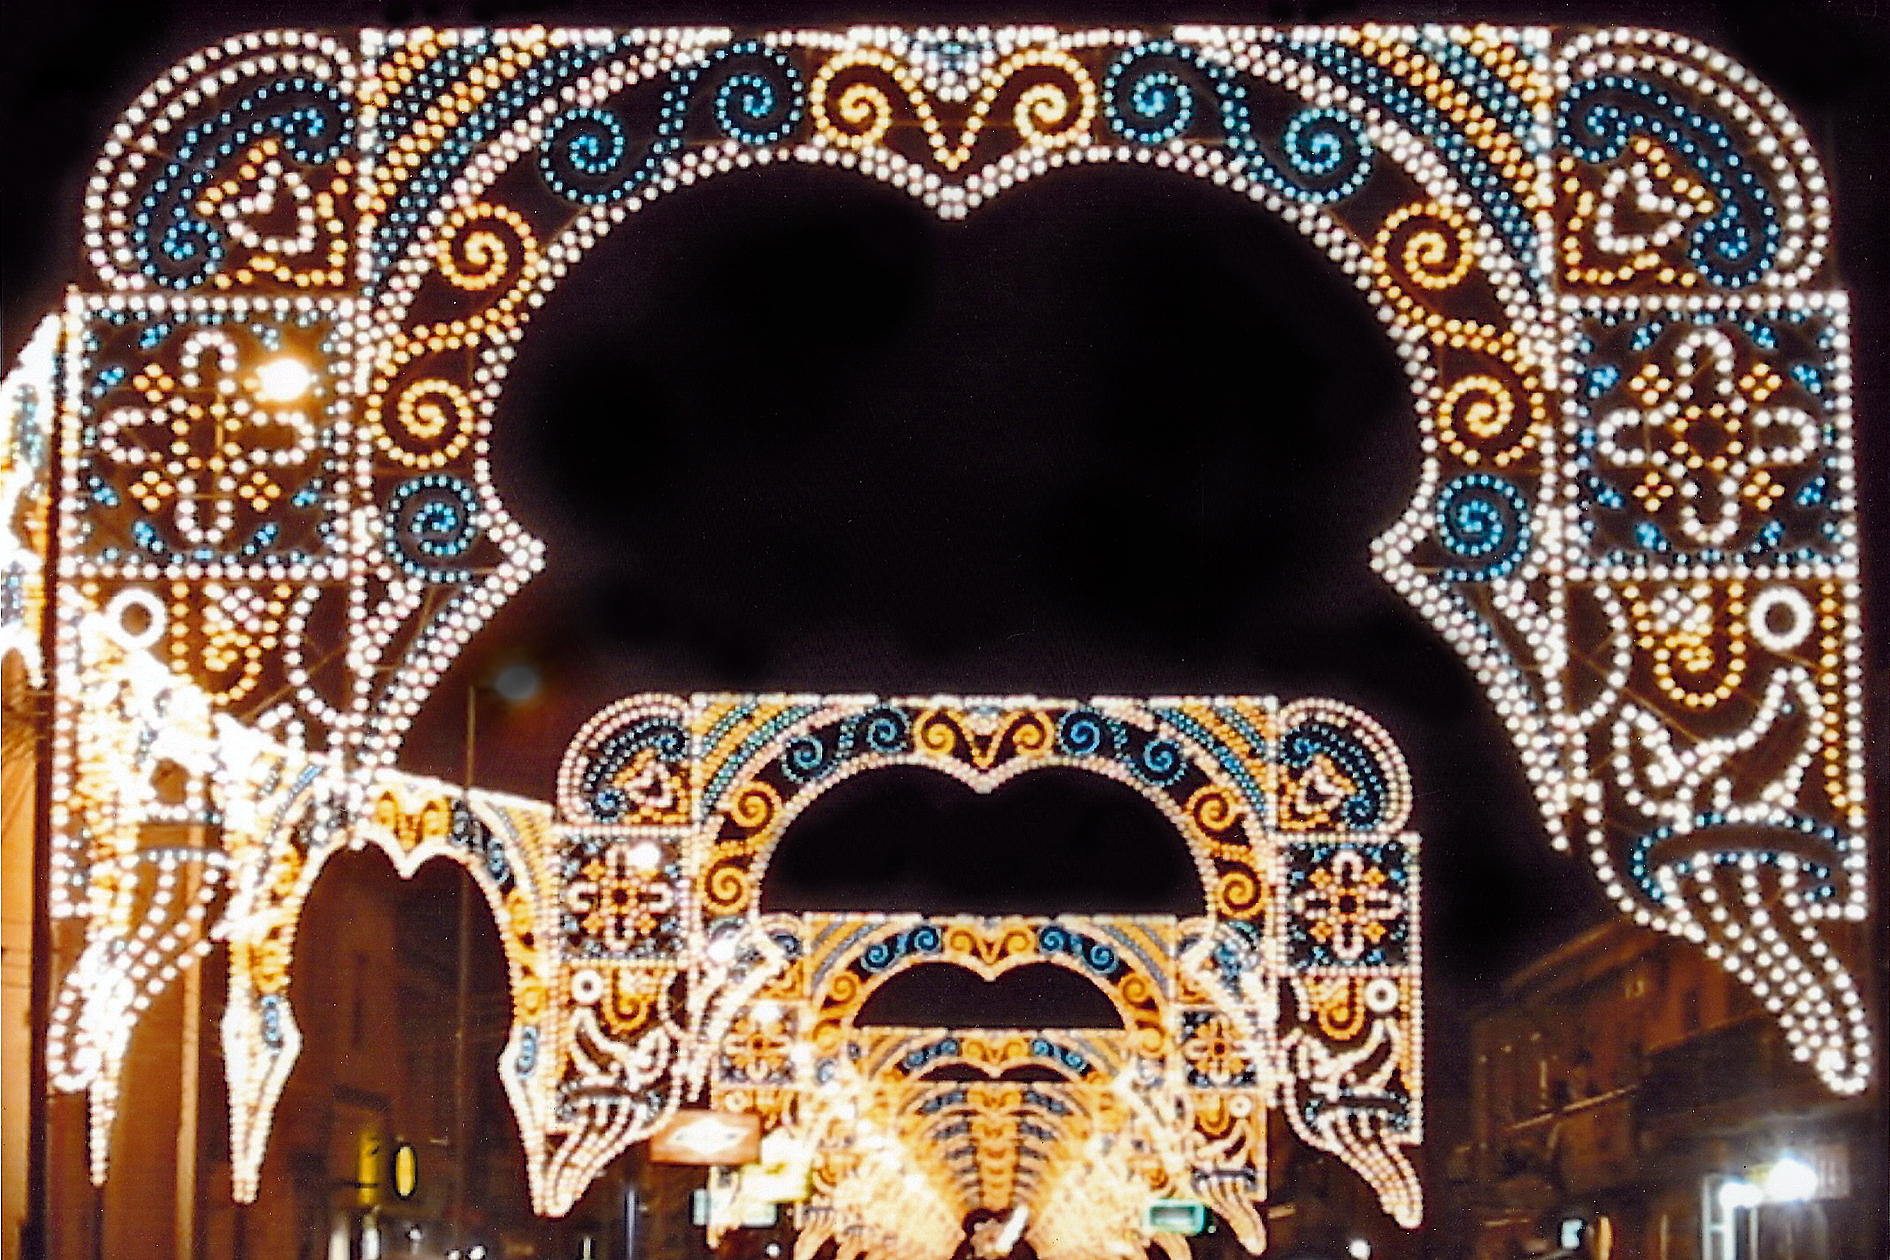 smontaggio addobbi natalizi caserta